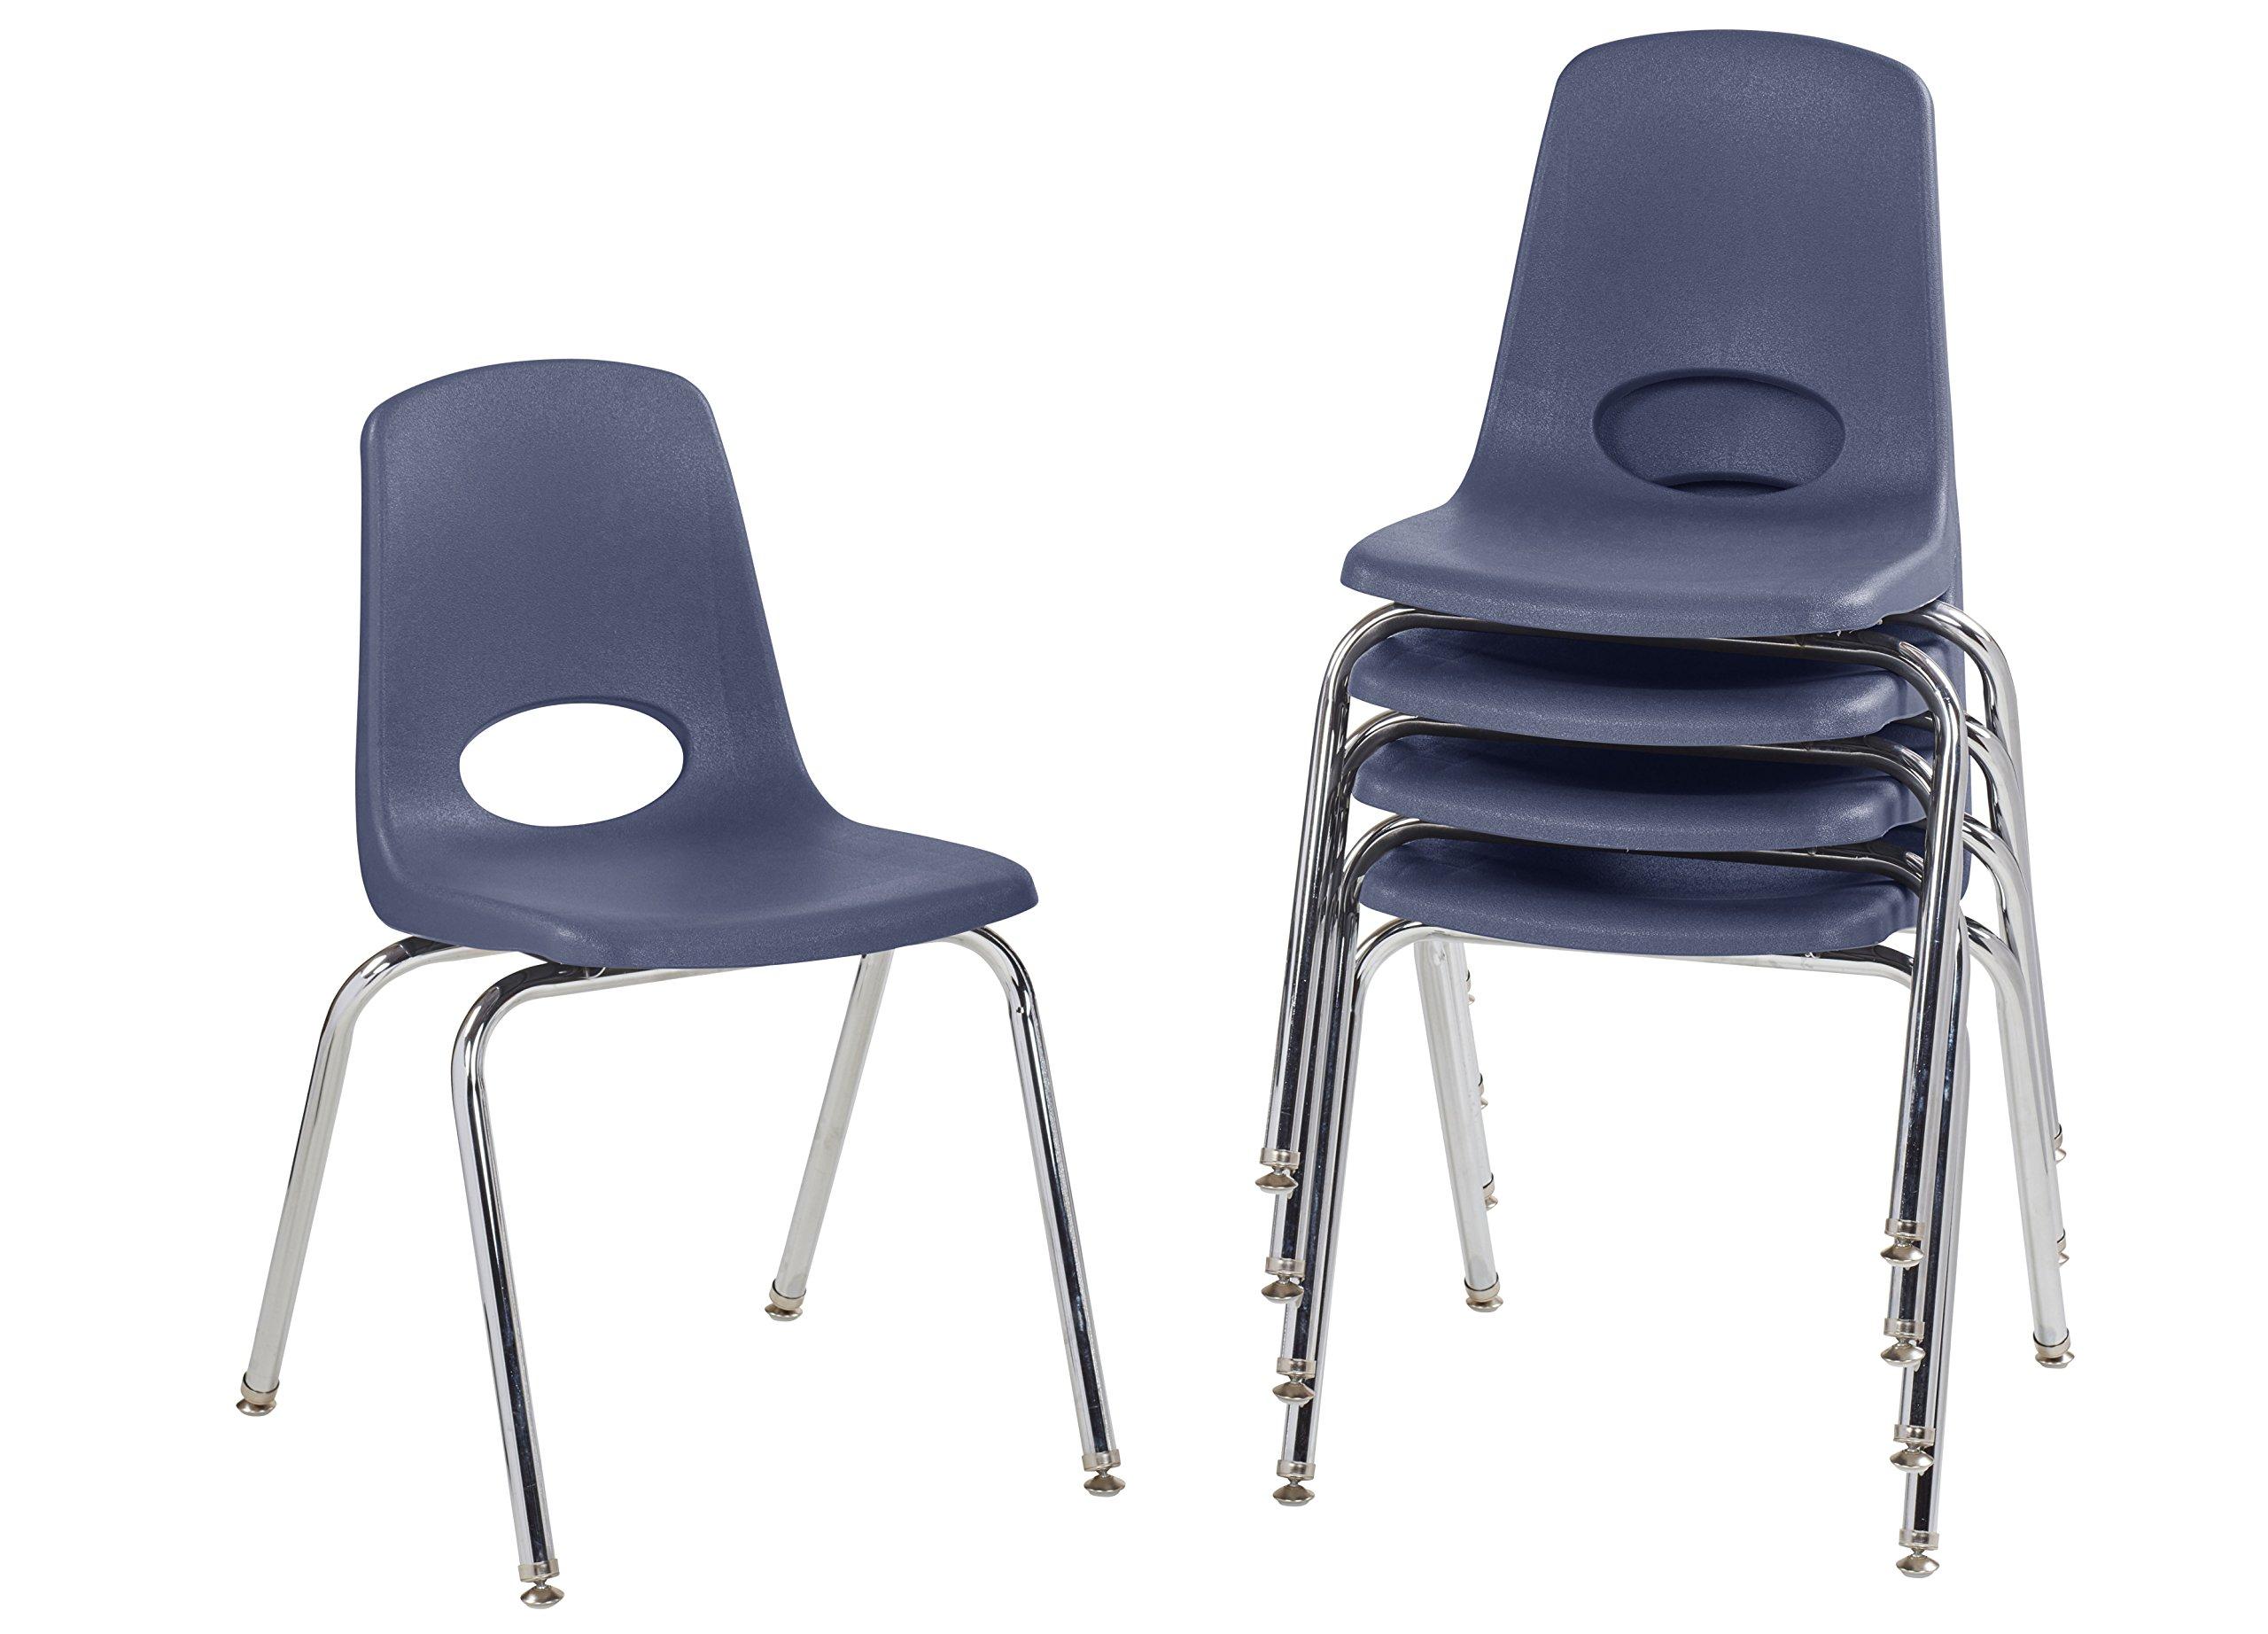 ECR4Kids 18'' School Stack Chair, Chrome Legs with Nylon Swivel Glides, Navy (5-Pack)